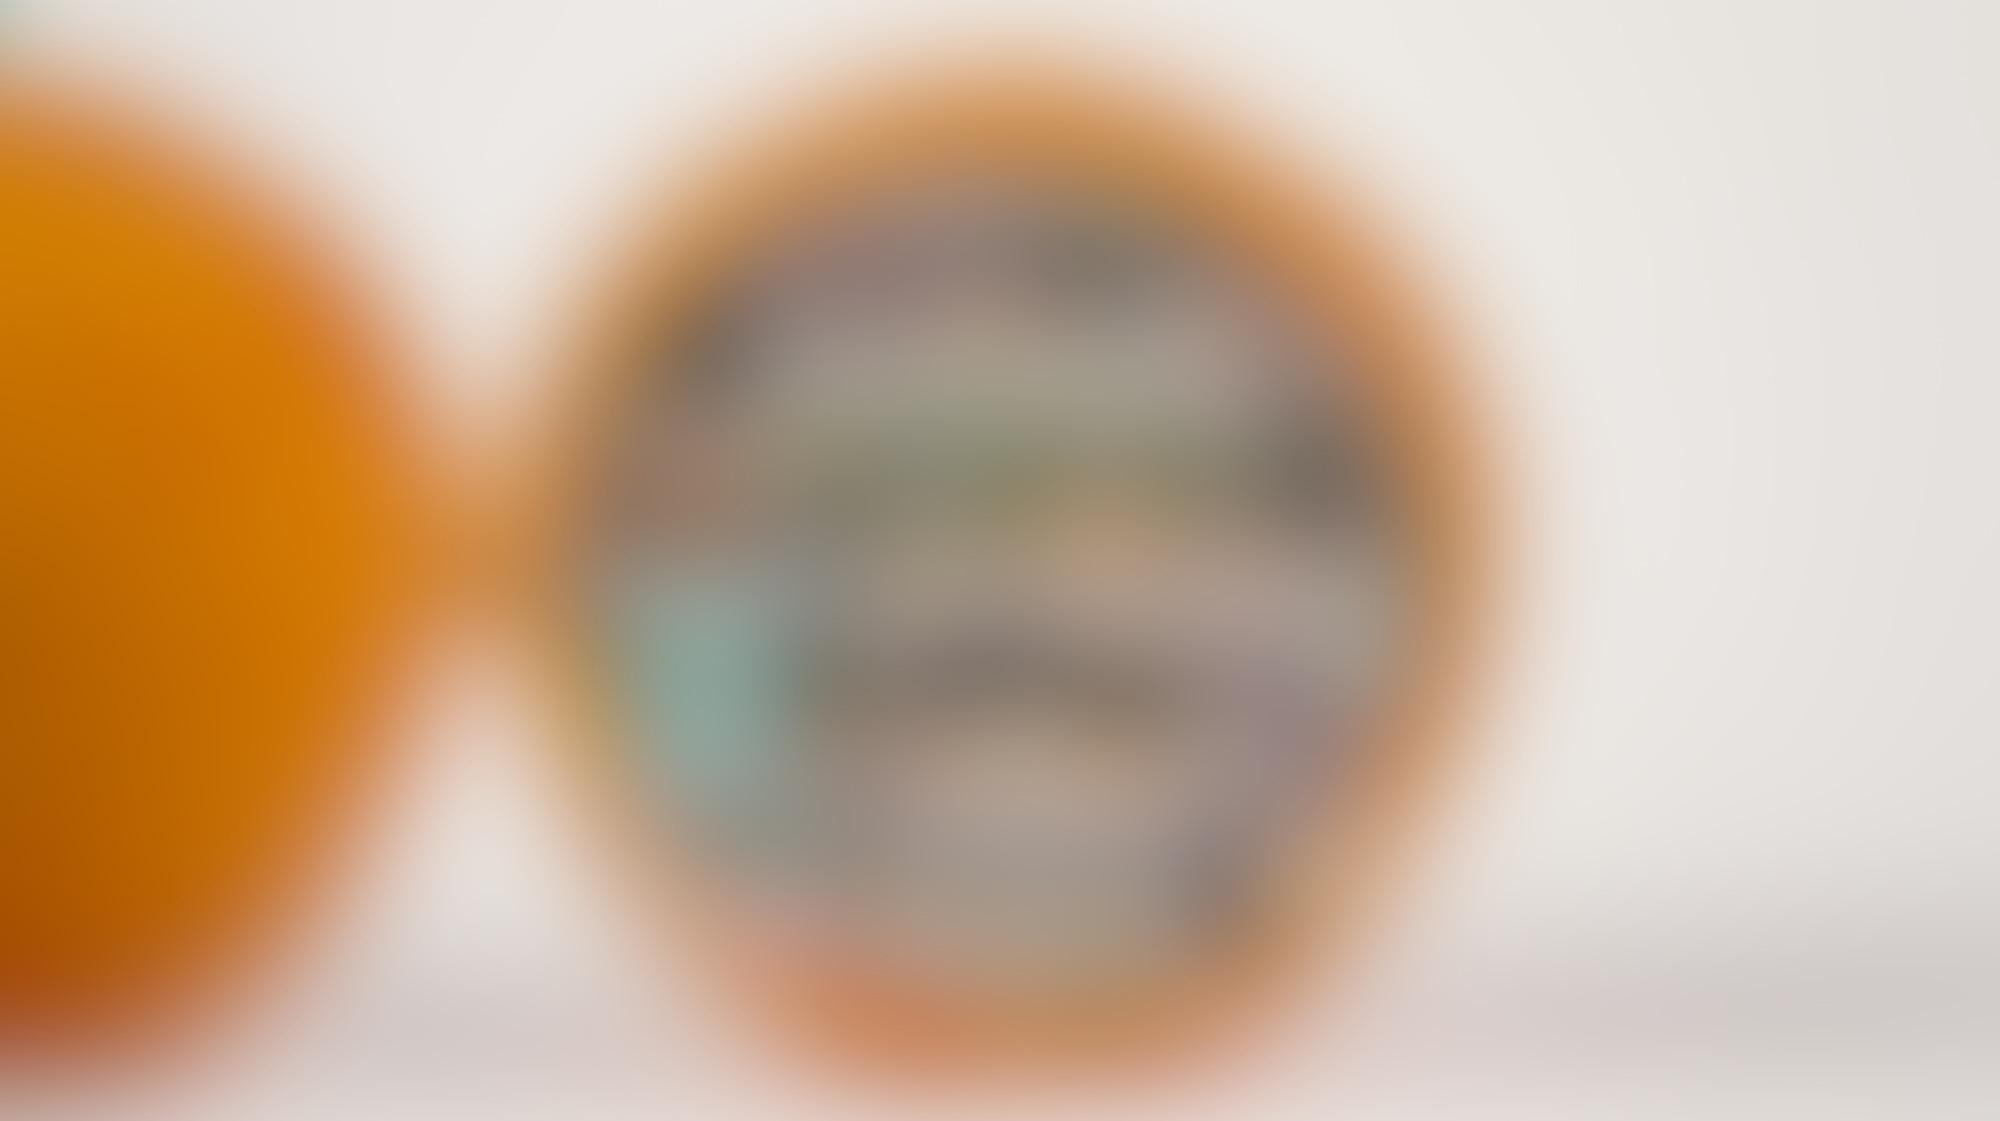 7 Fruit pastille model autocompressfitresizeixlibphp 1 1 0max h2000max w3 D2000q80sa290602f75964615950418860ff44cf9